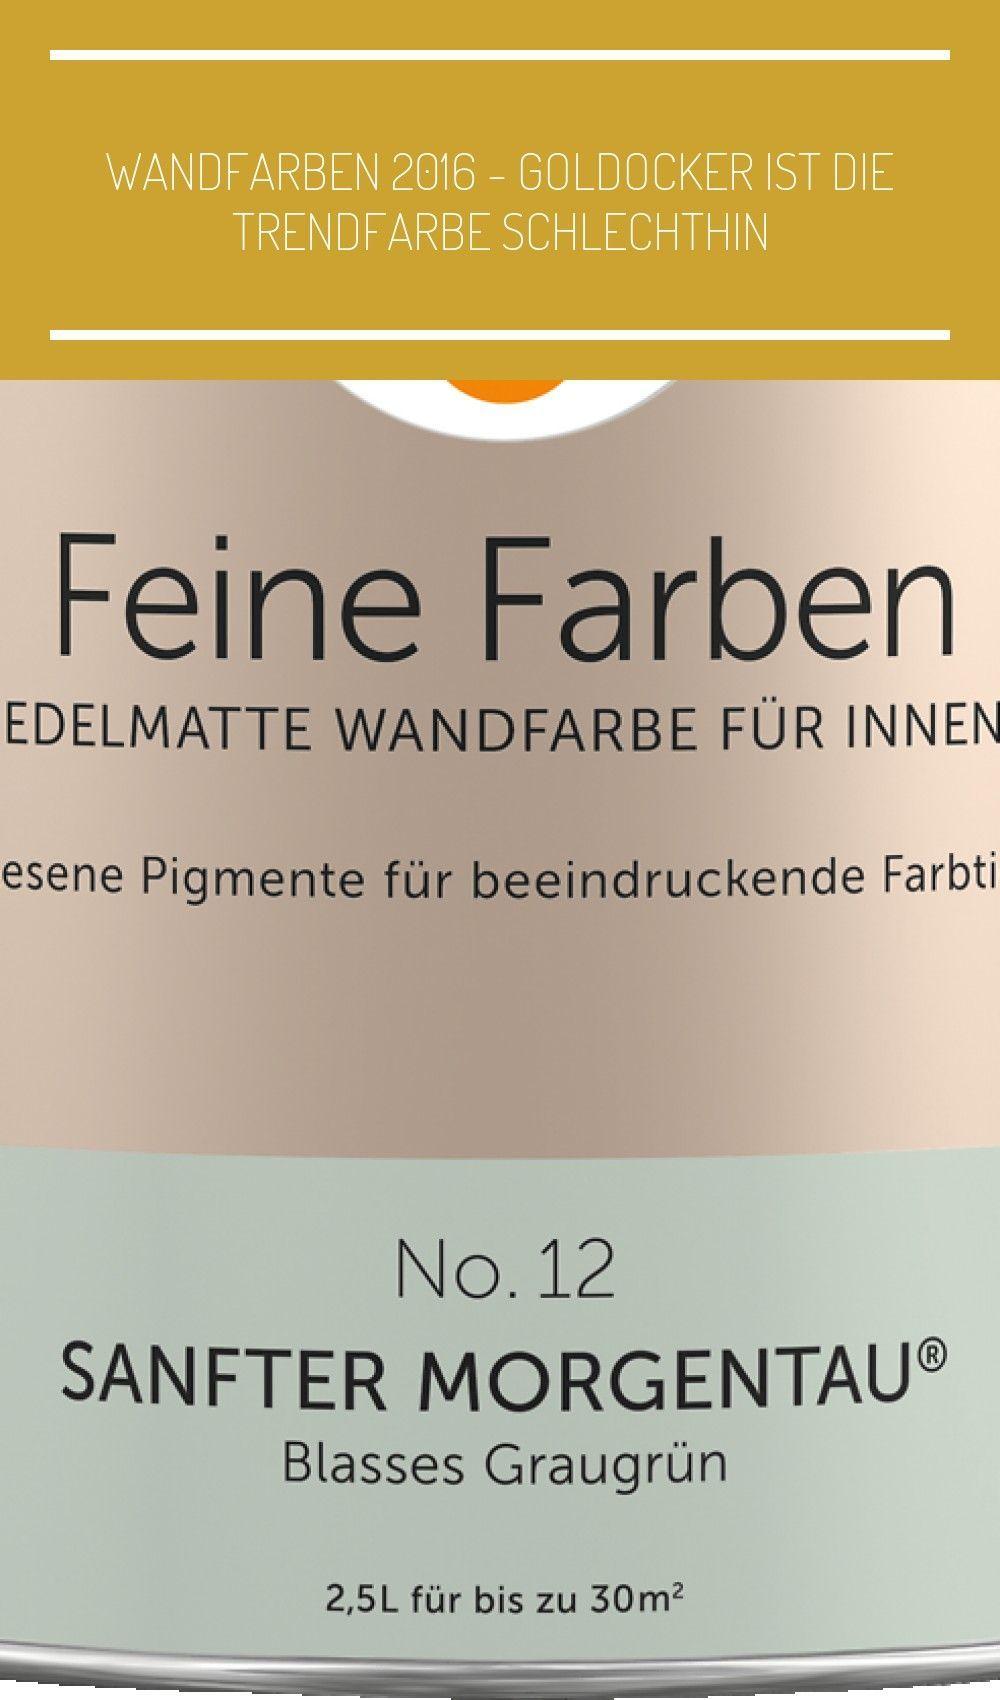 Alpina Feine Farben No 12 Sanfter Morgentau Blasses Graugrun